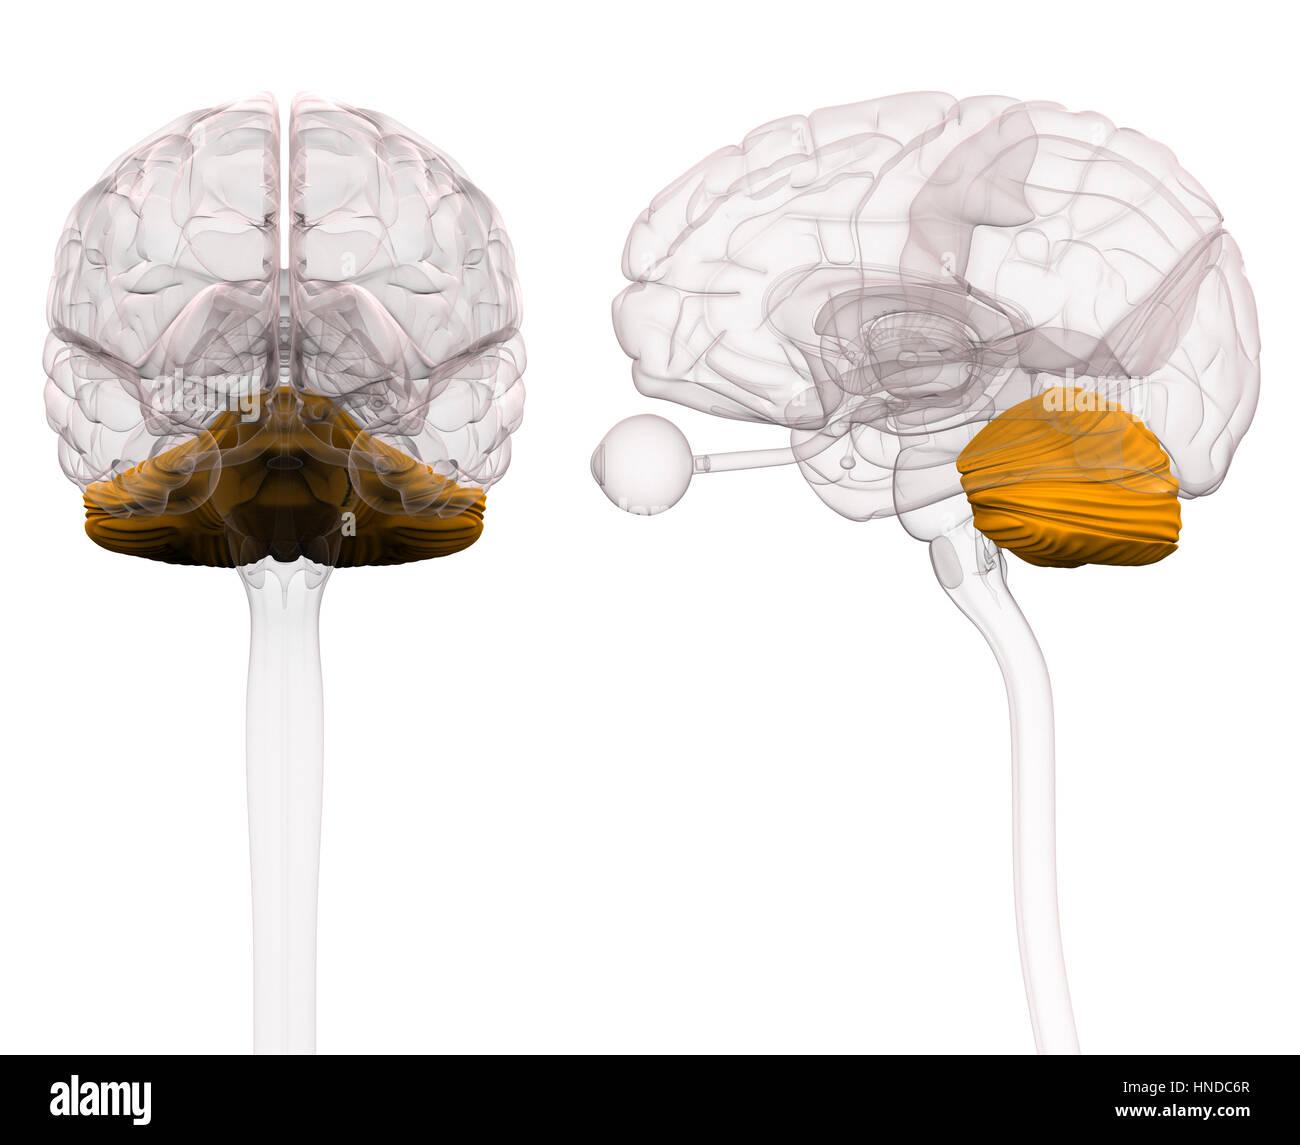 Cerebellum Brain Anatomy - 3d illustration - Stock Image